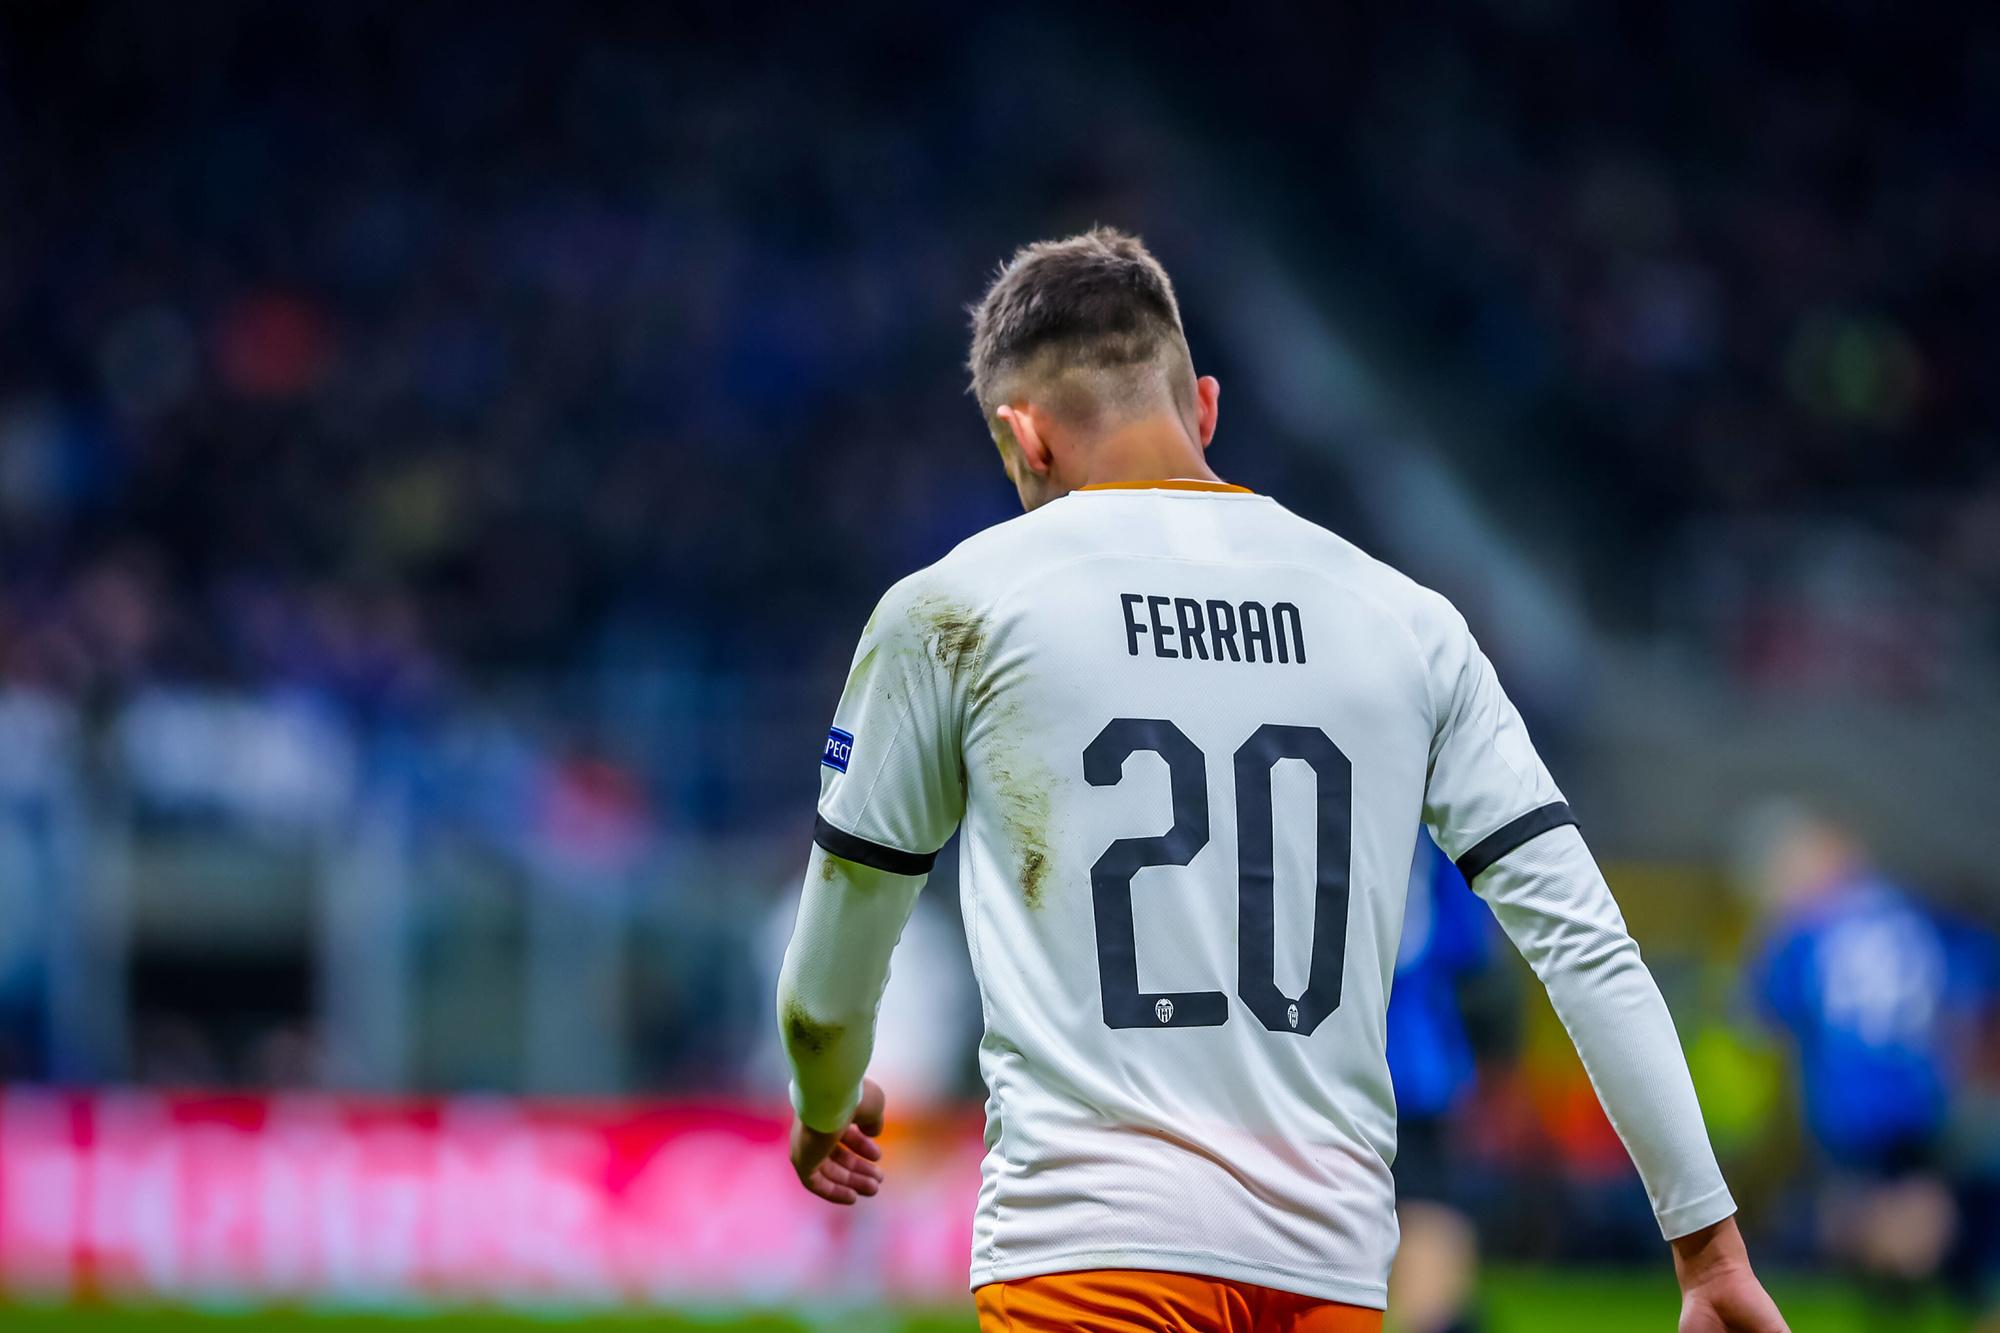 Ferran Torres avec son maillot valencien, floqué de son prénom., IMAGO